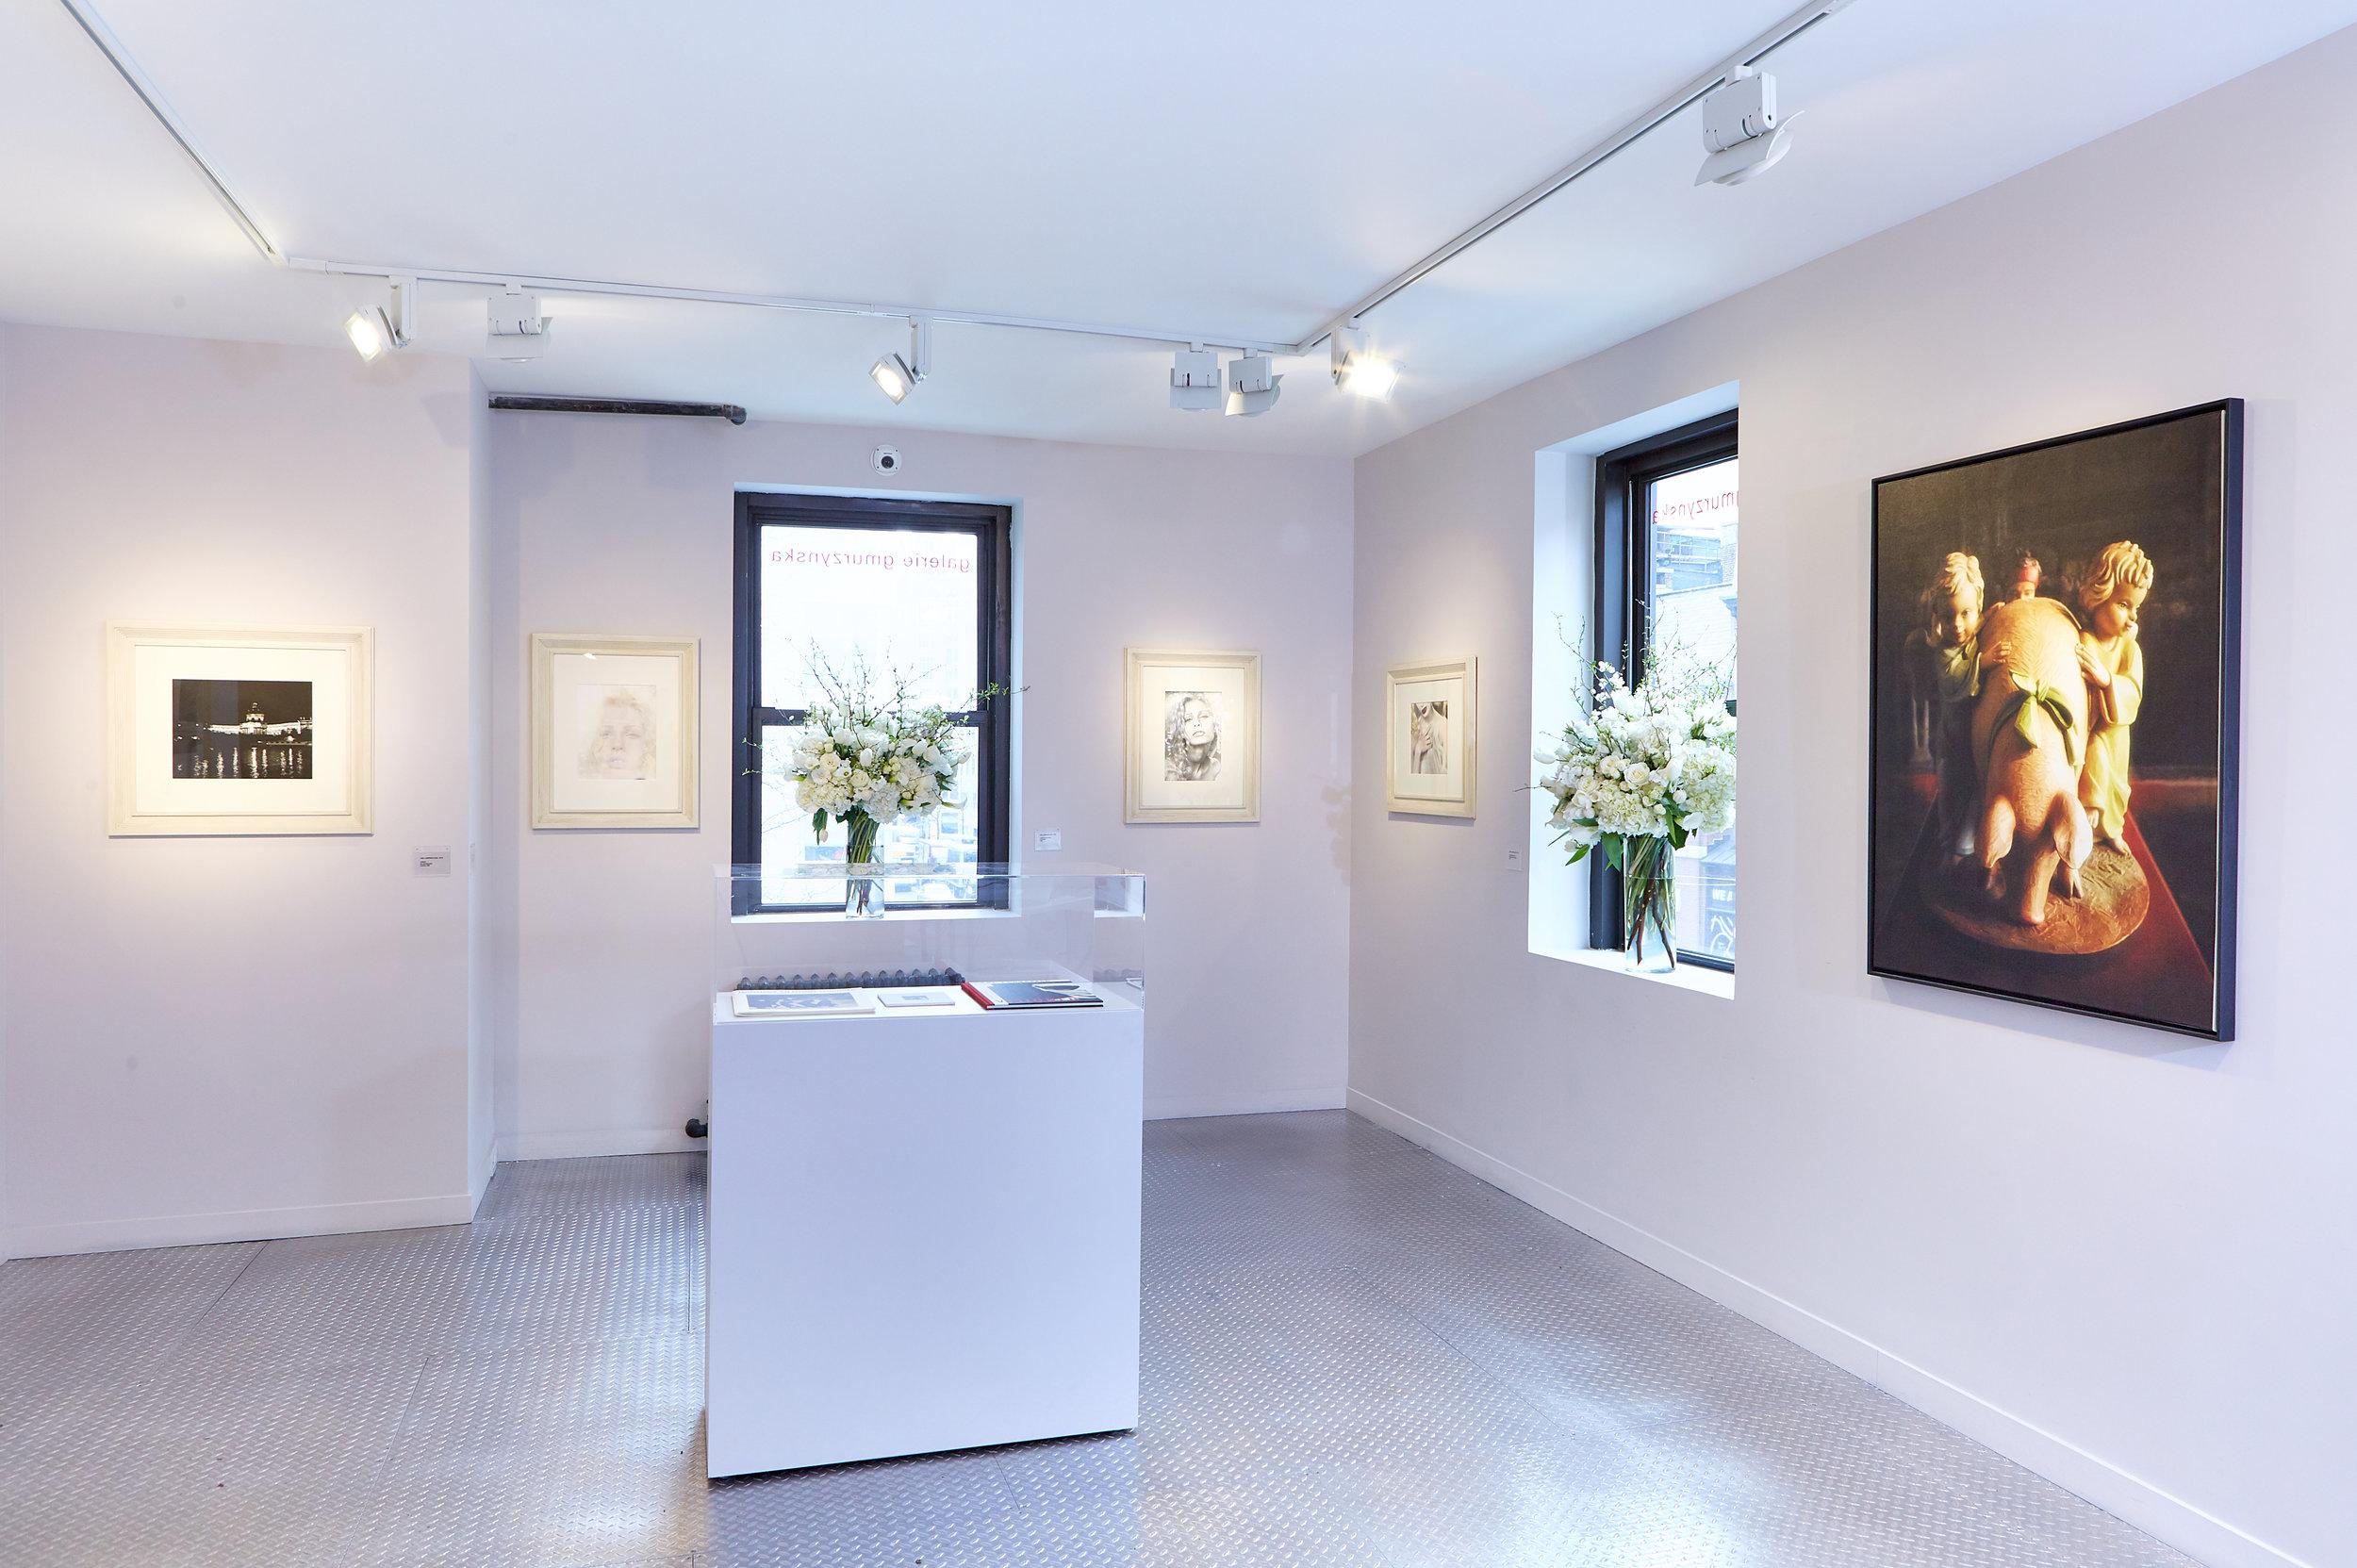 Installation view. Joseph Jagos for Galerie Gmurzynska.